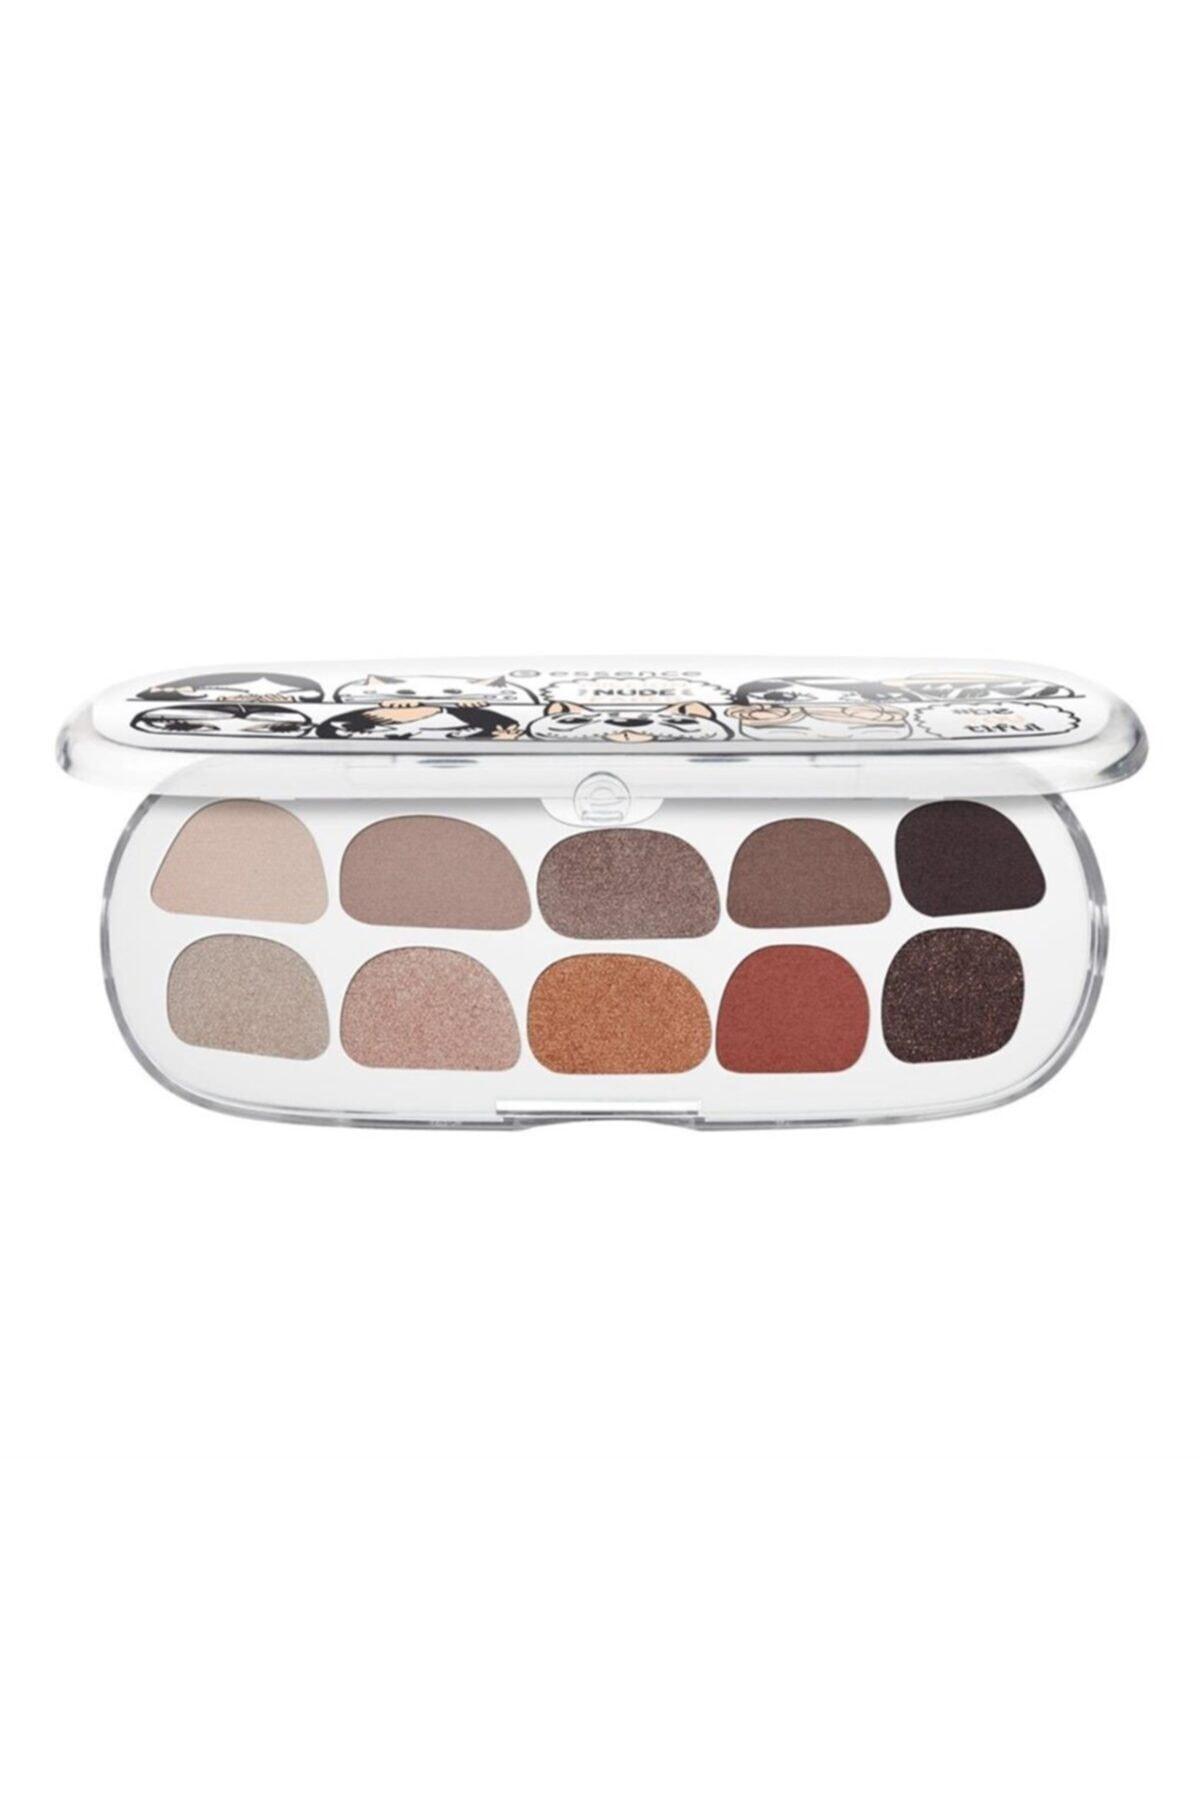 Essence Göz Farı Paleti - Million Nude Faces Eyeshadow Box 01 4059729005038 2